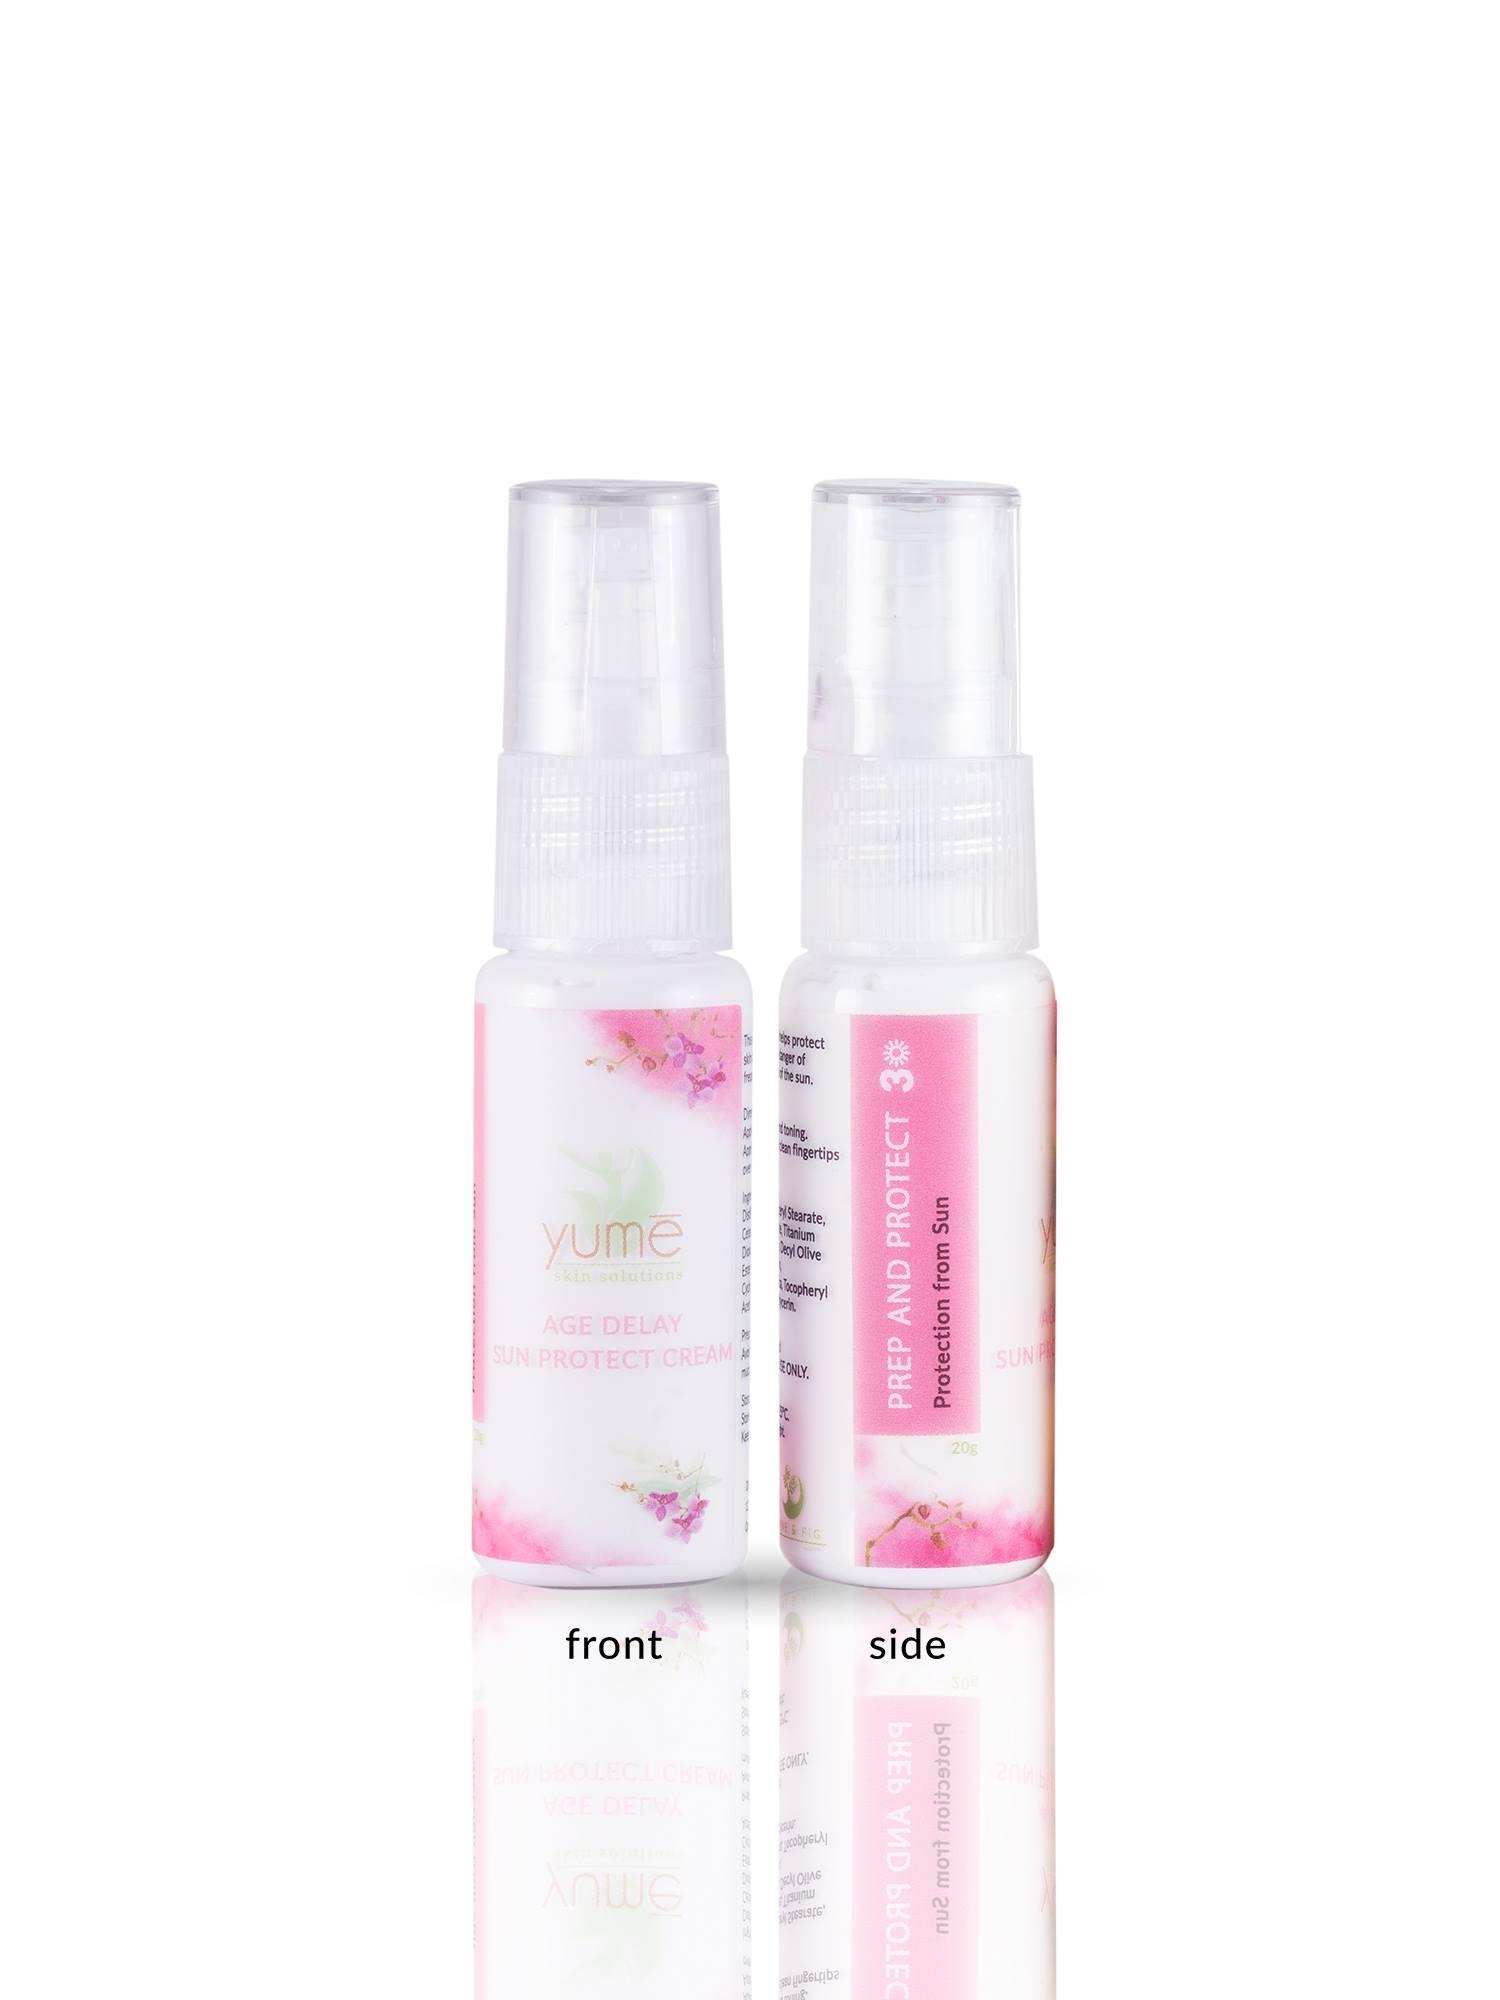 Age Delay Sun Protect Cream By Yume Skin.